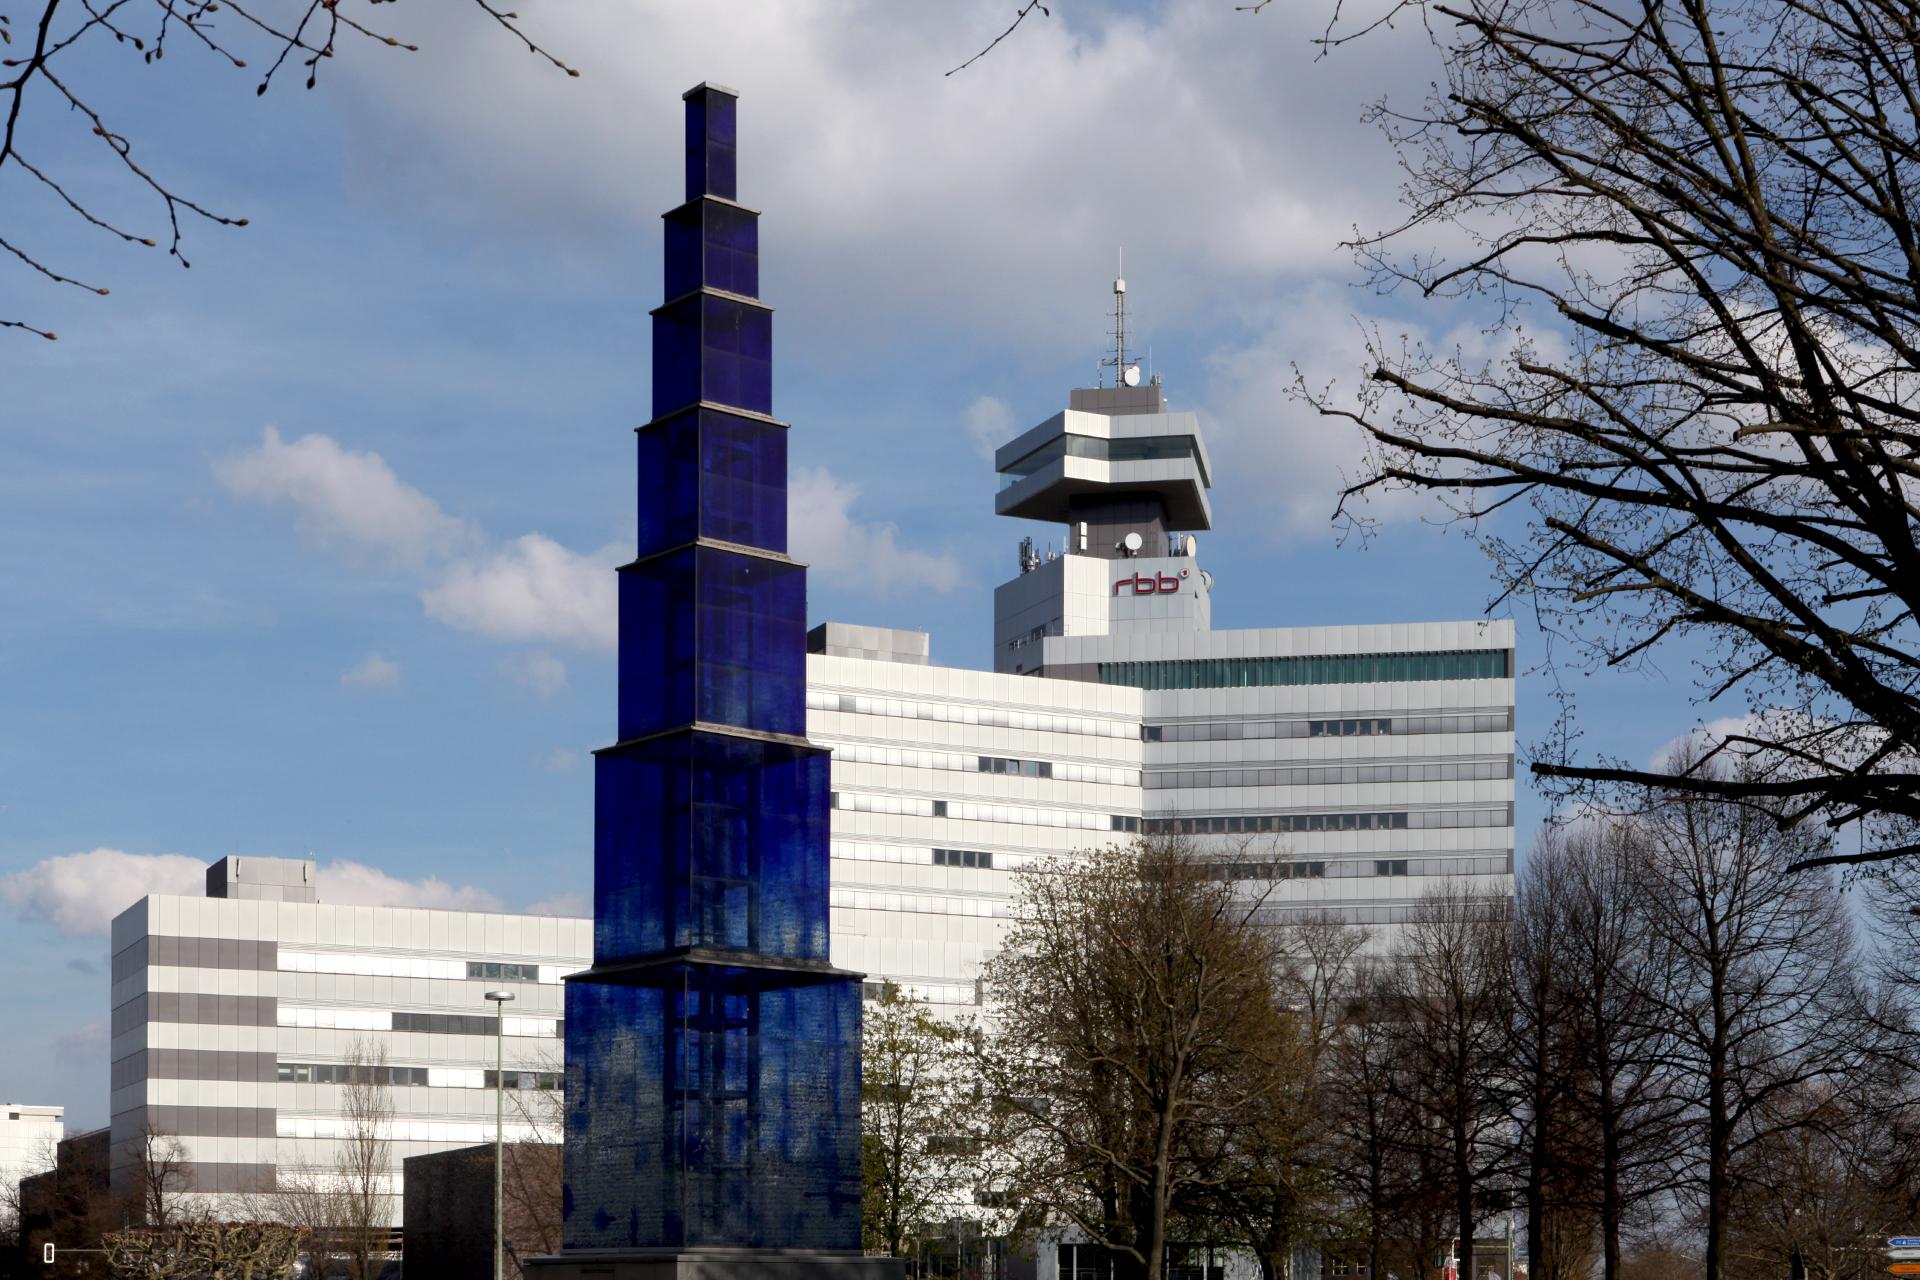 rbb,theodor-heuss-platz,Theo,Charlottenburg,Berlin-Charlottenburg,blauer Obelisk,Hella Santarossa